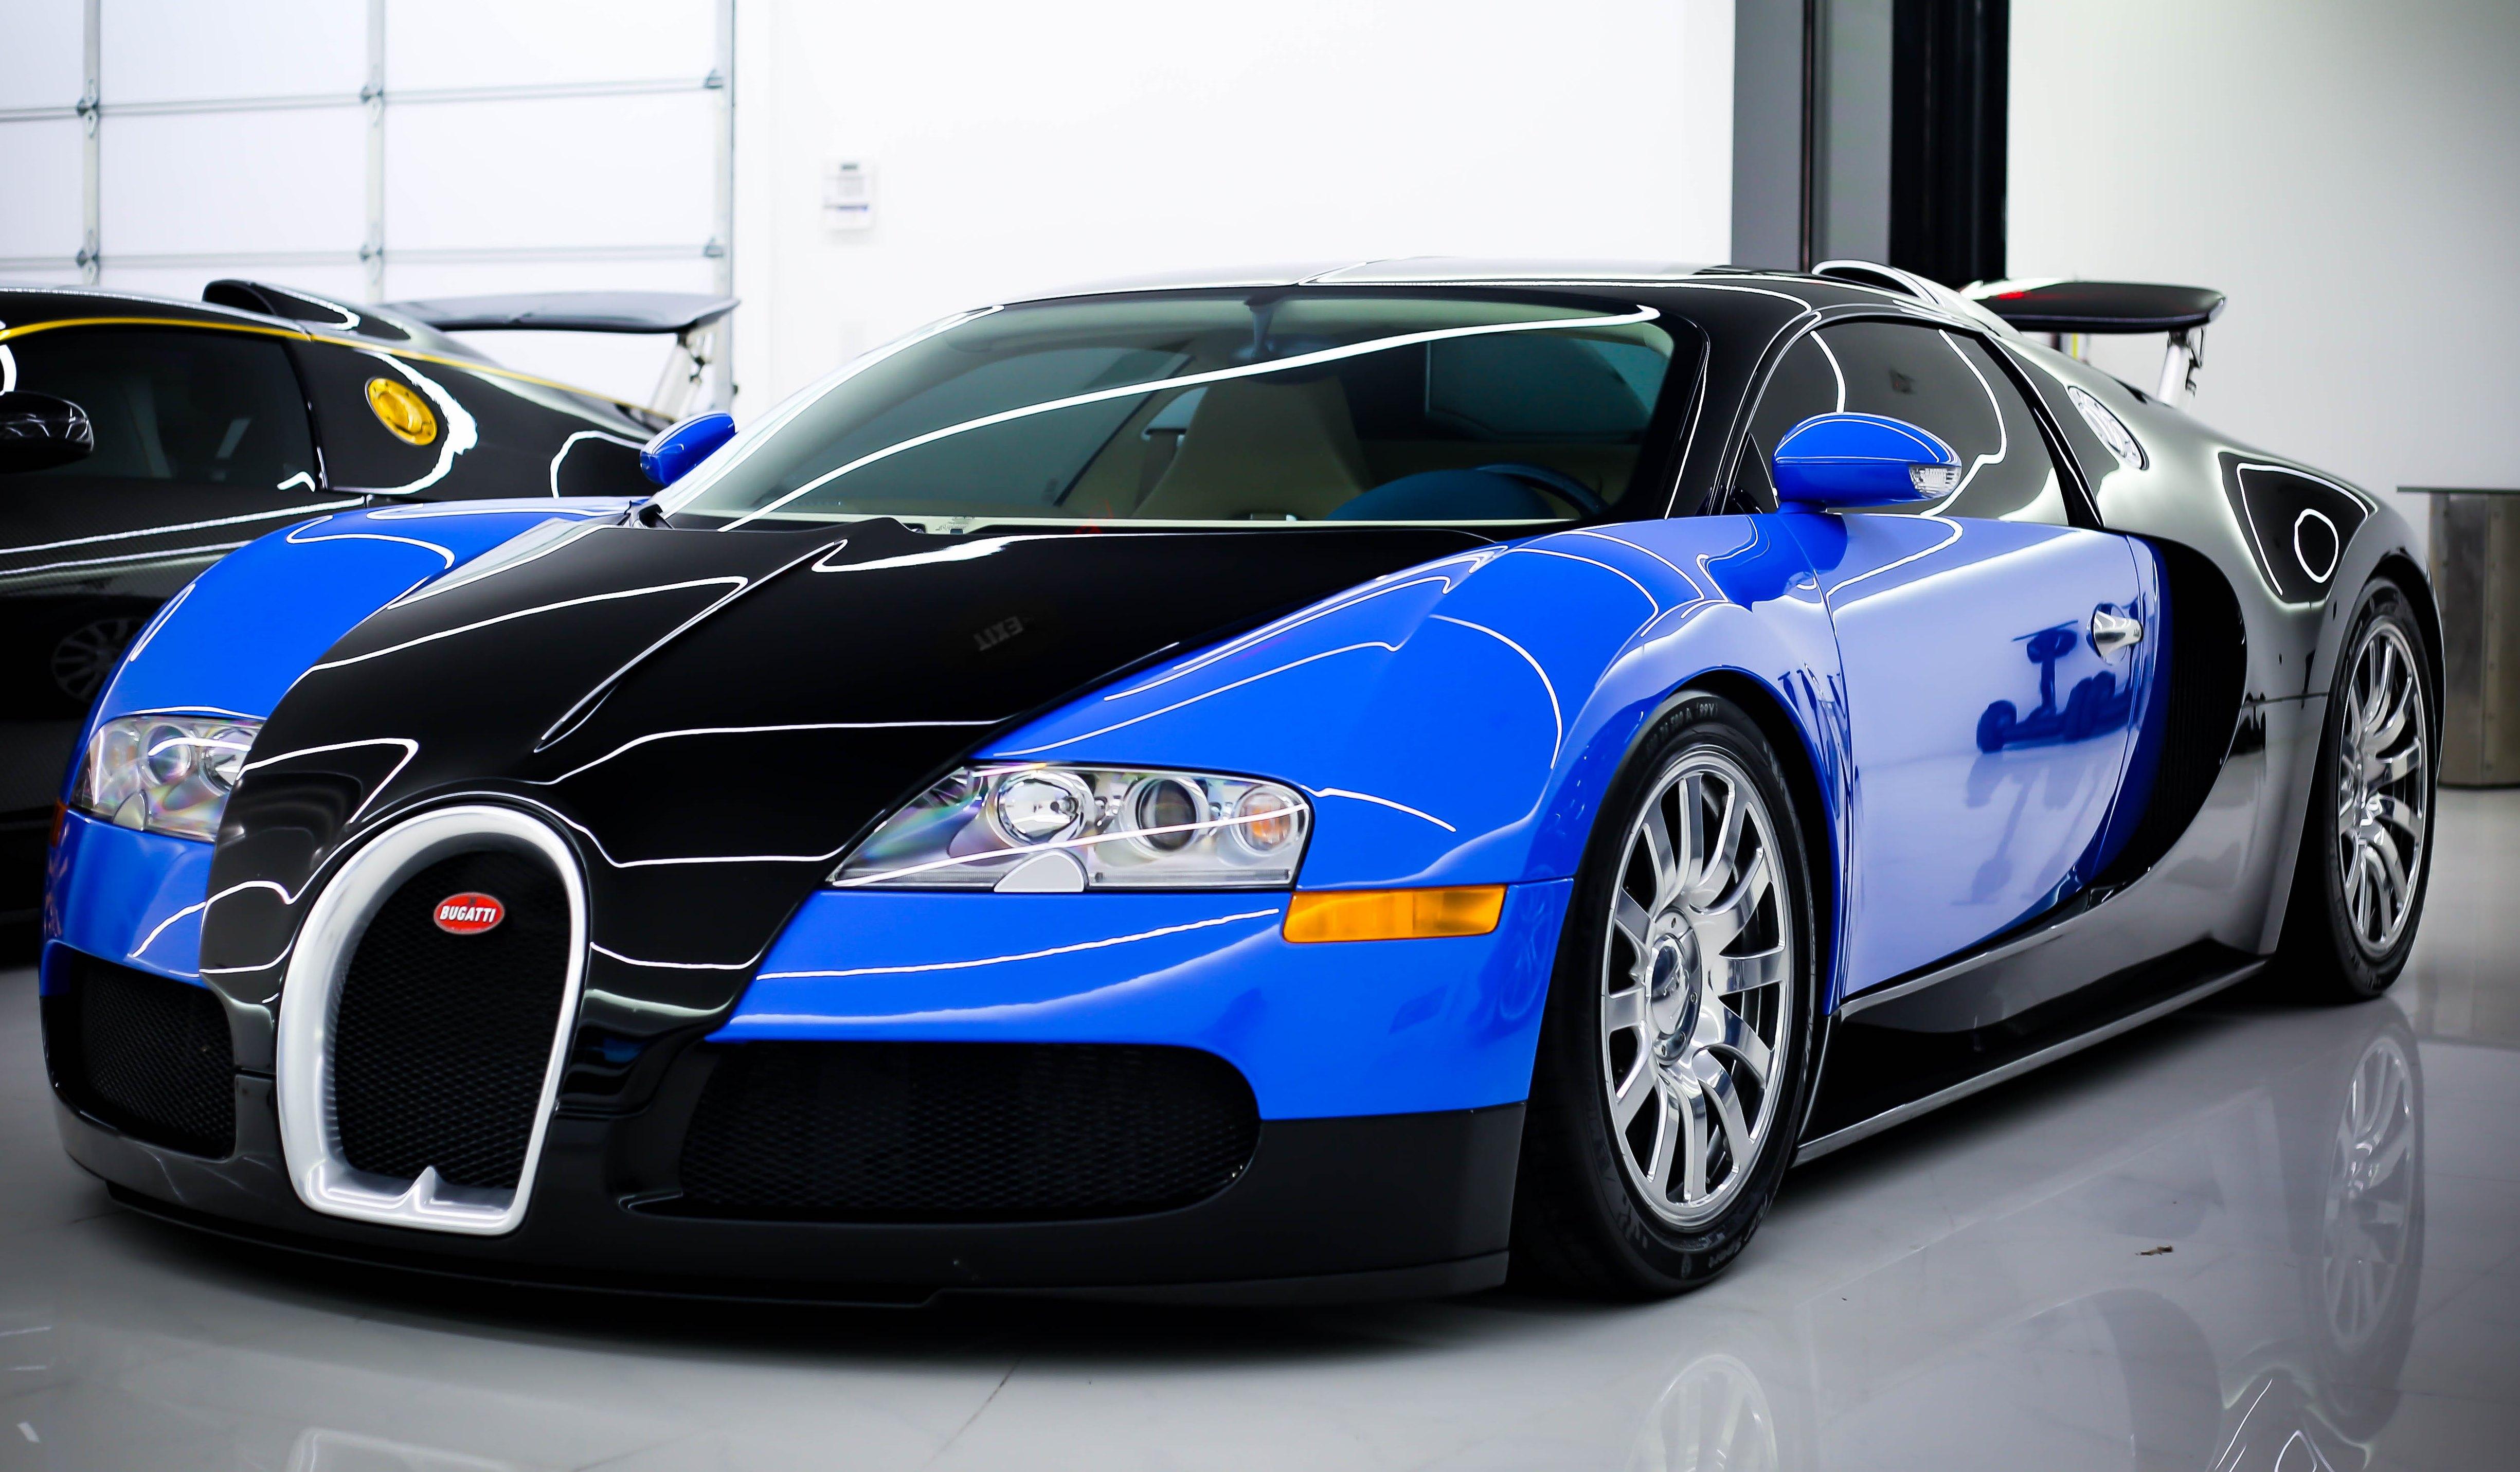 Blue Bugatti Veyron: » 2008 Bugatti Veyron……SOLD Exotic Car Search